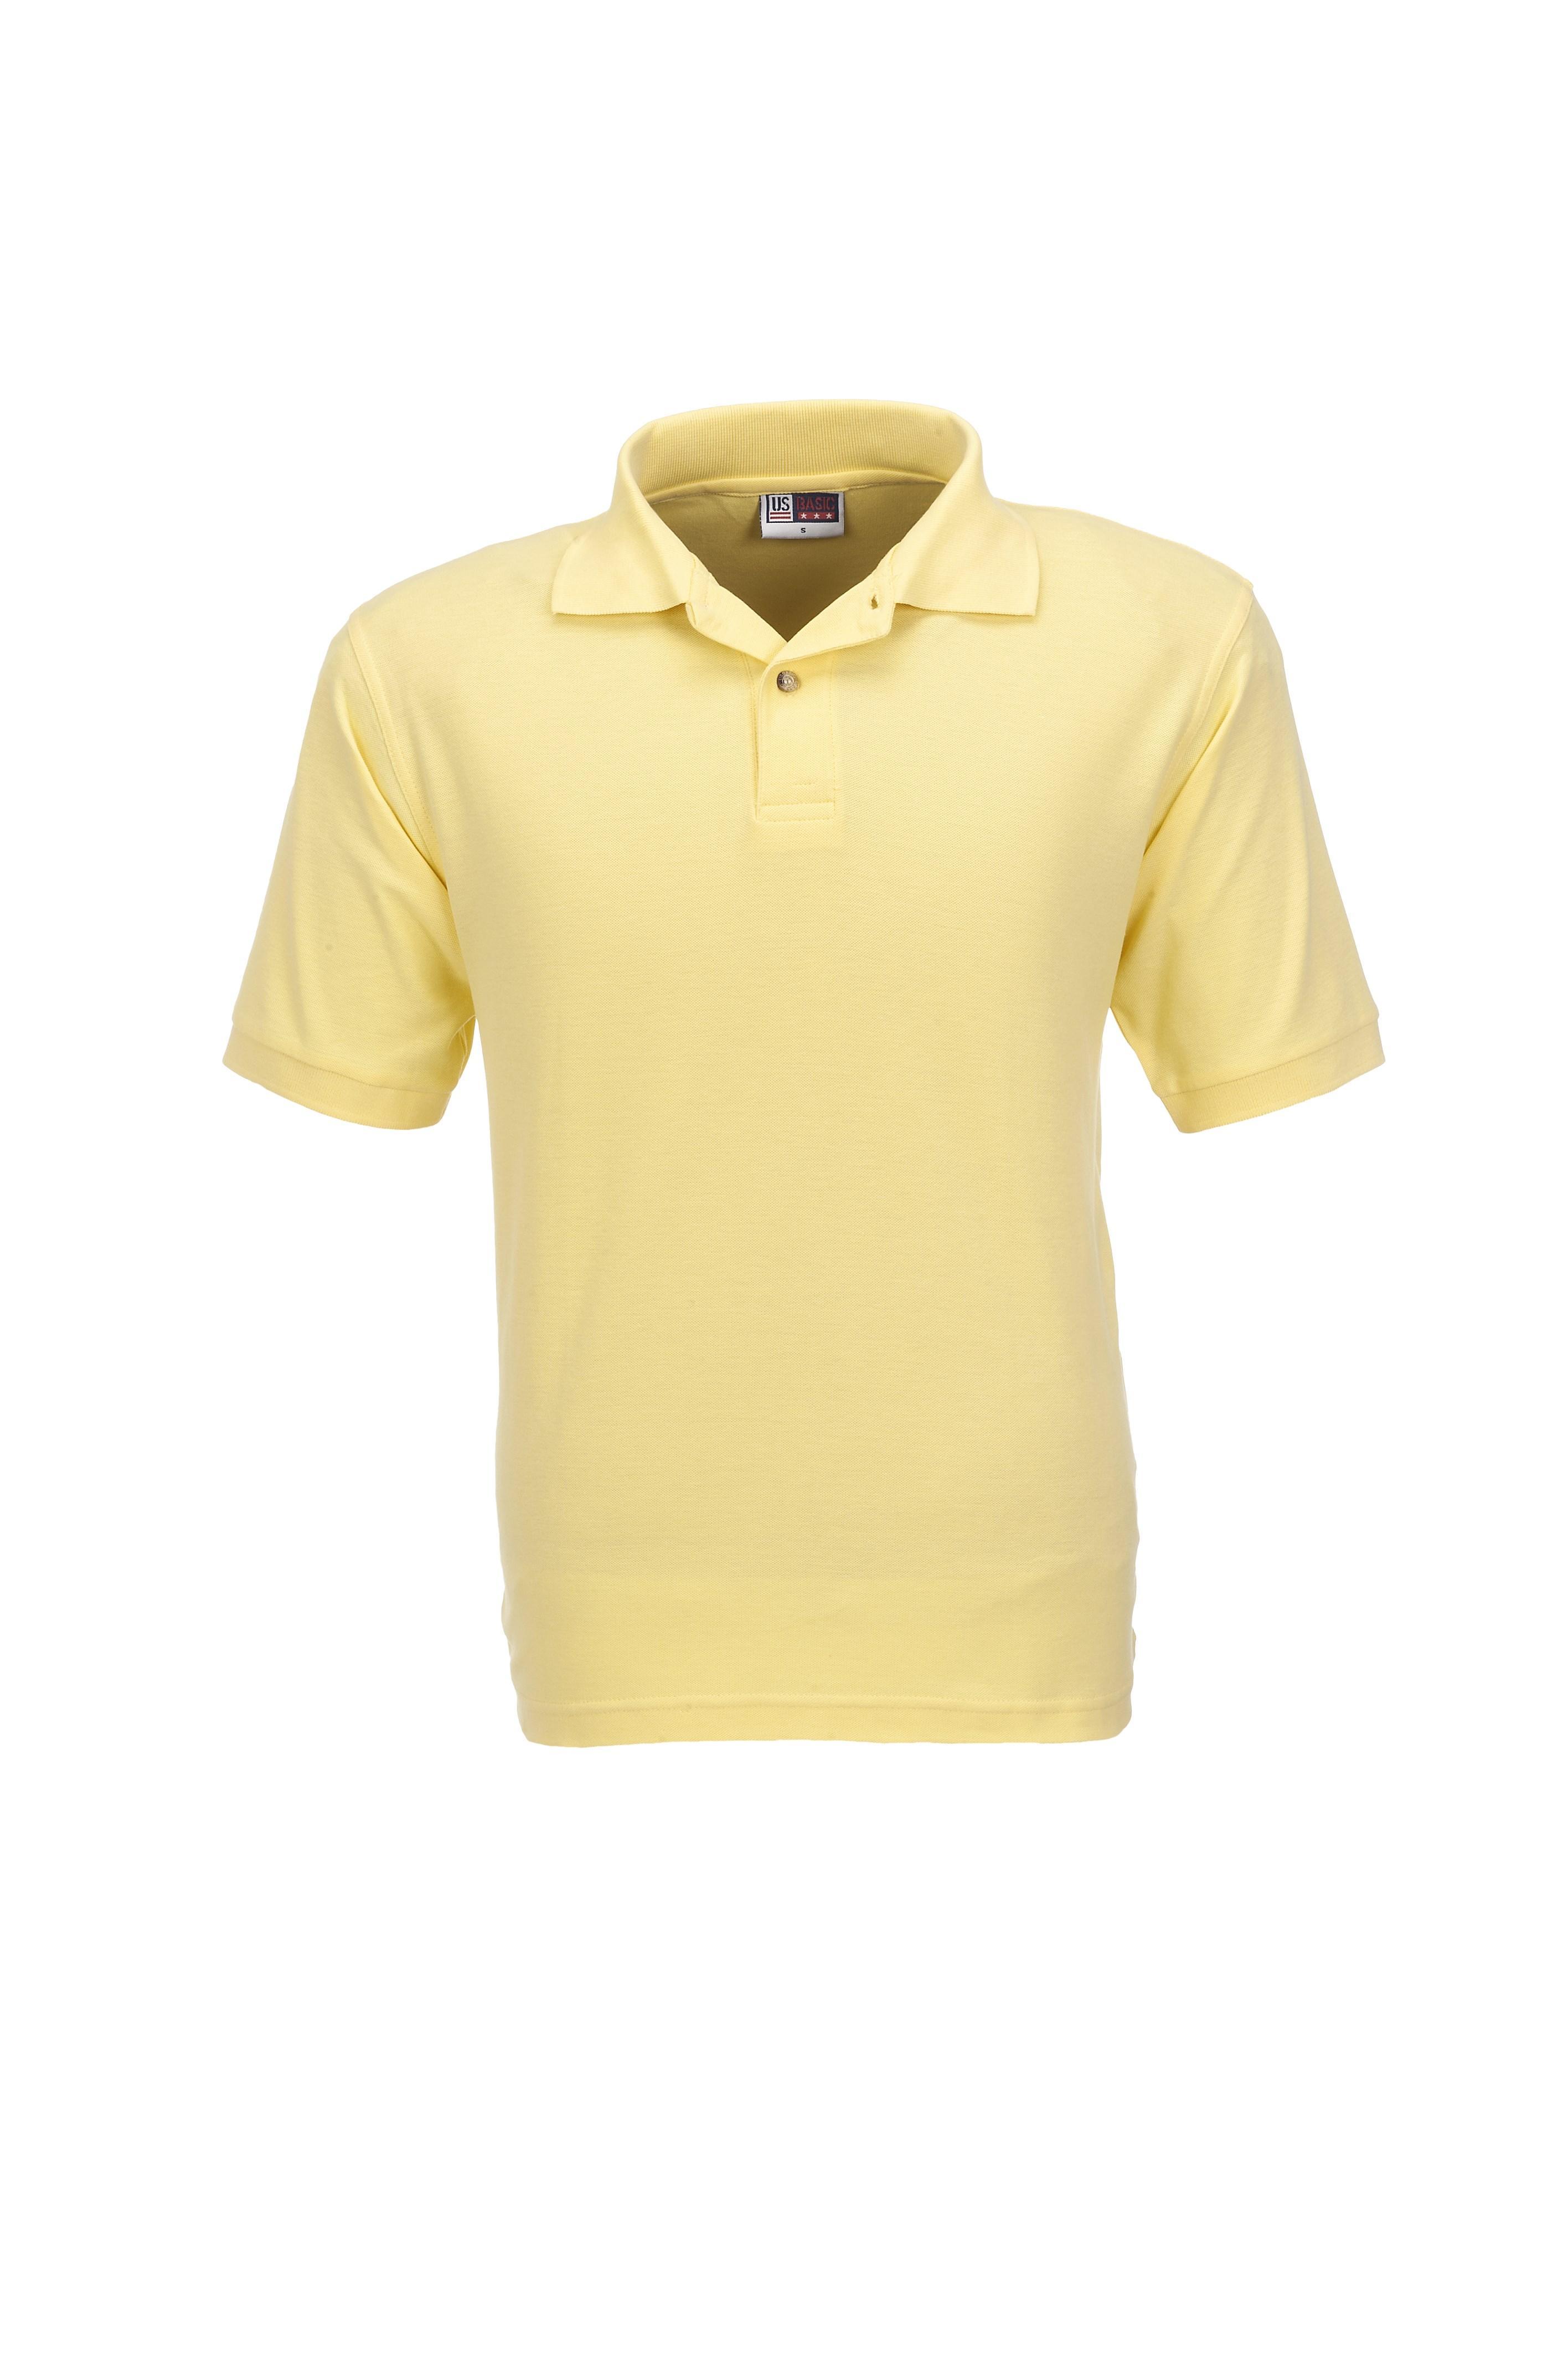 Mens Boston Golf Shirt - Yellow Only